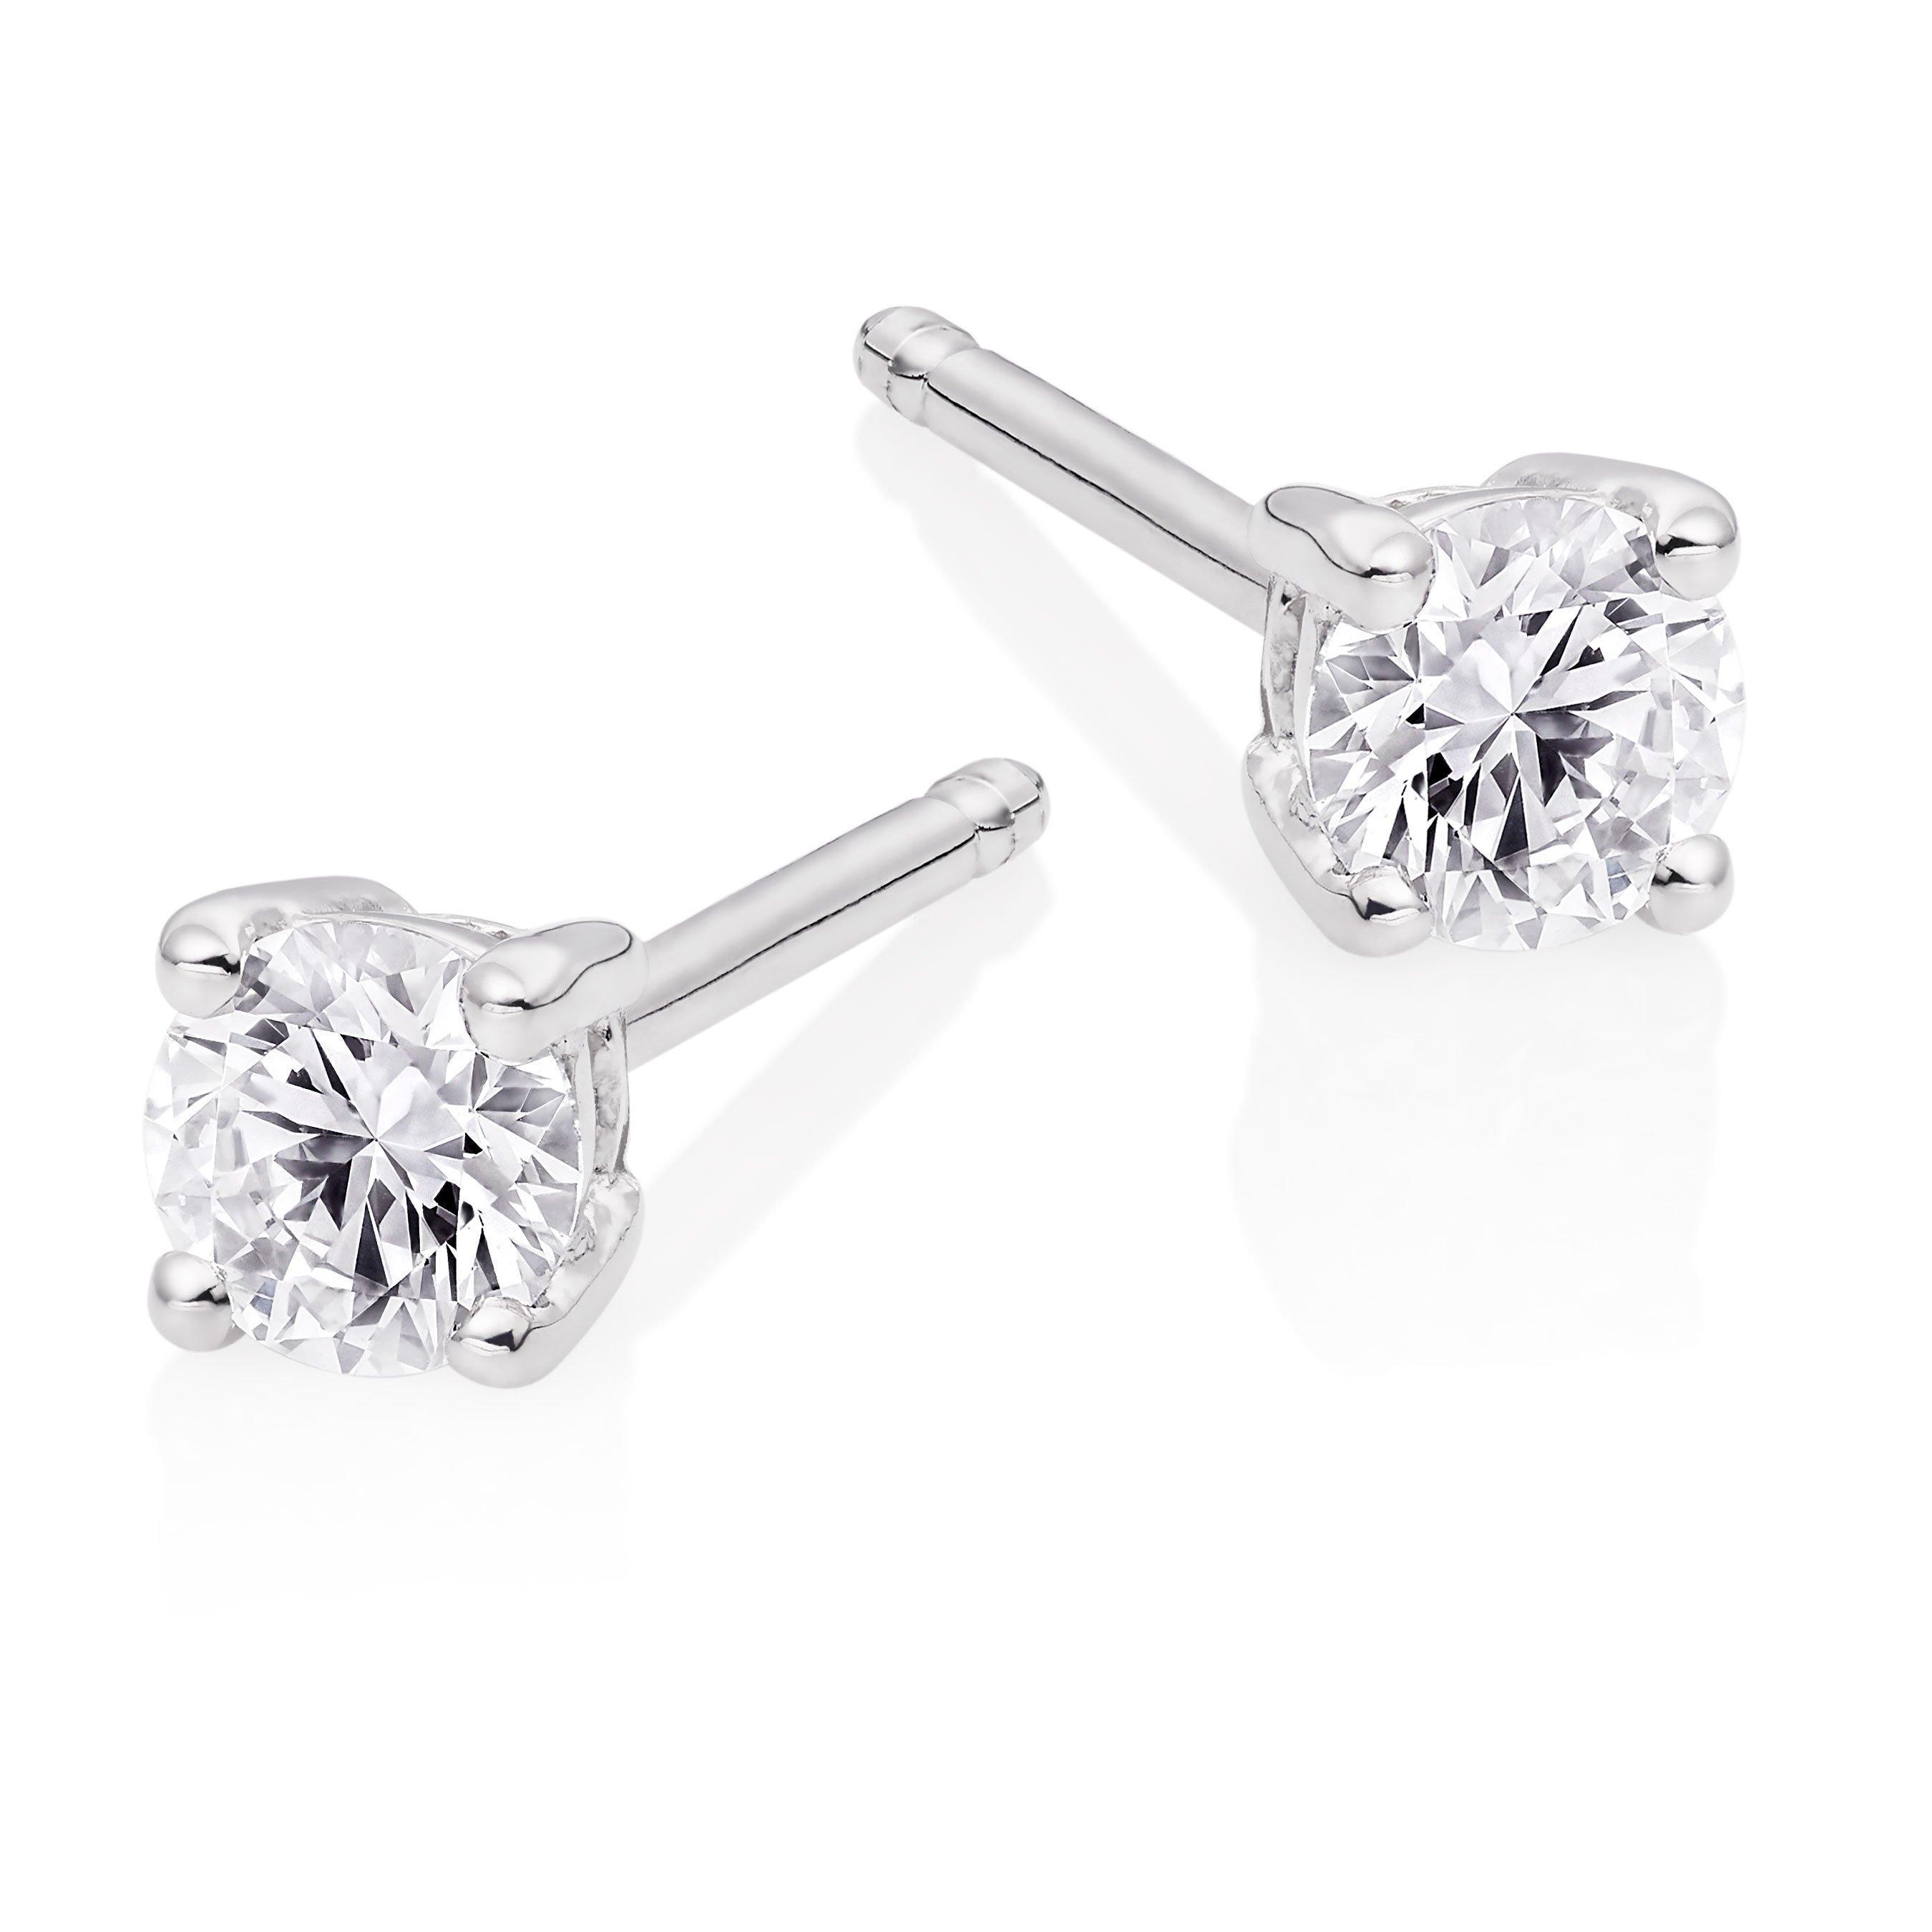 18ct White Gold Diamond Stud Earrings